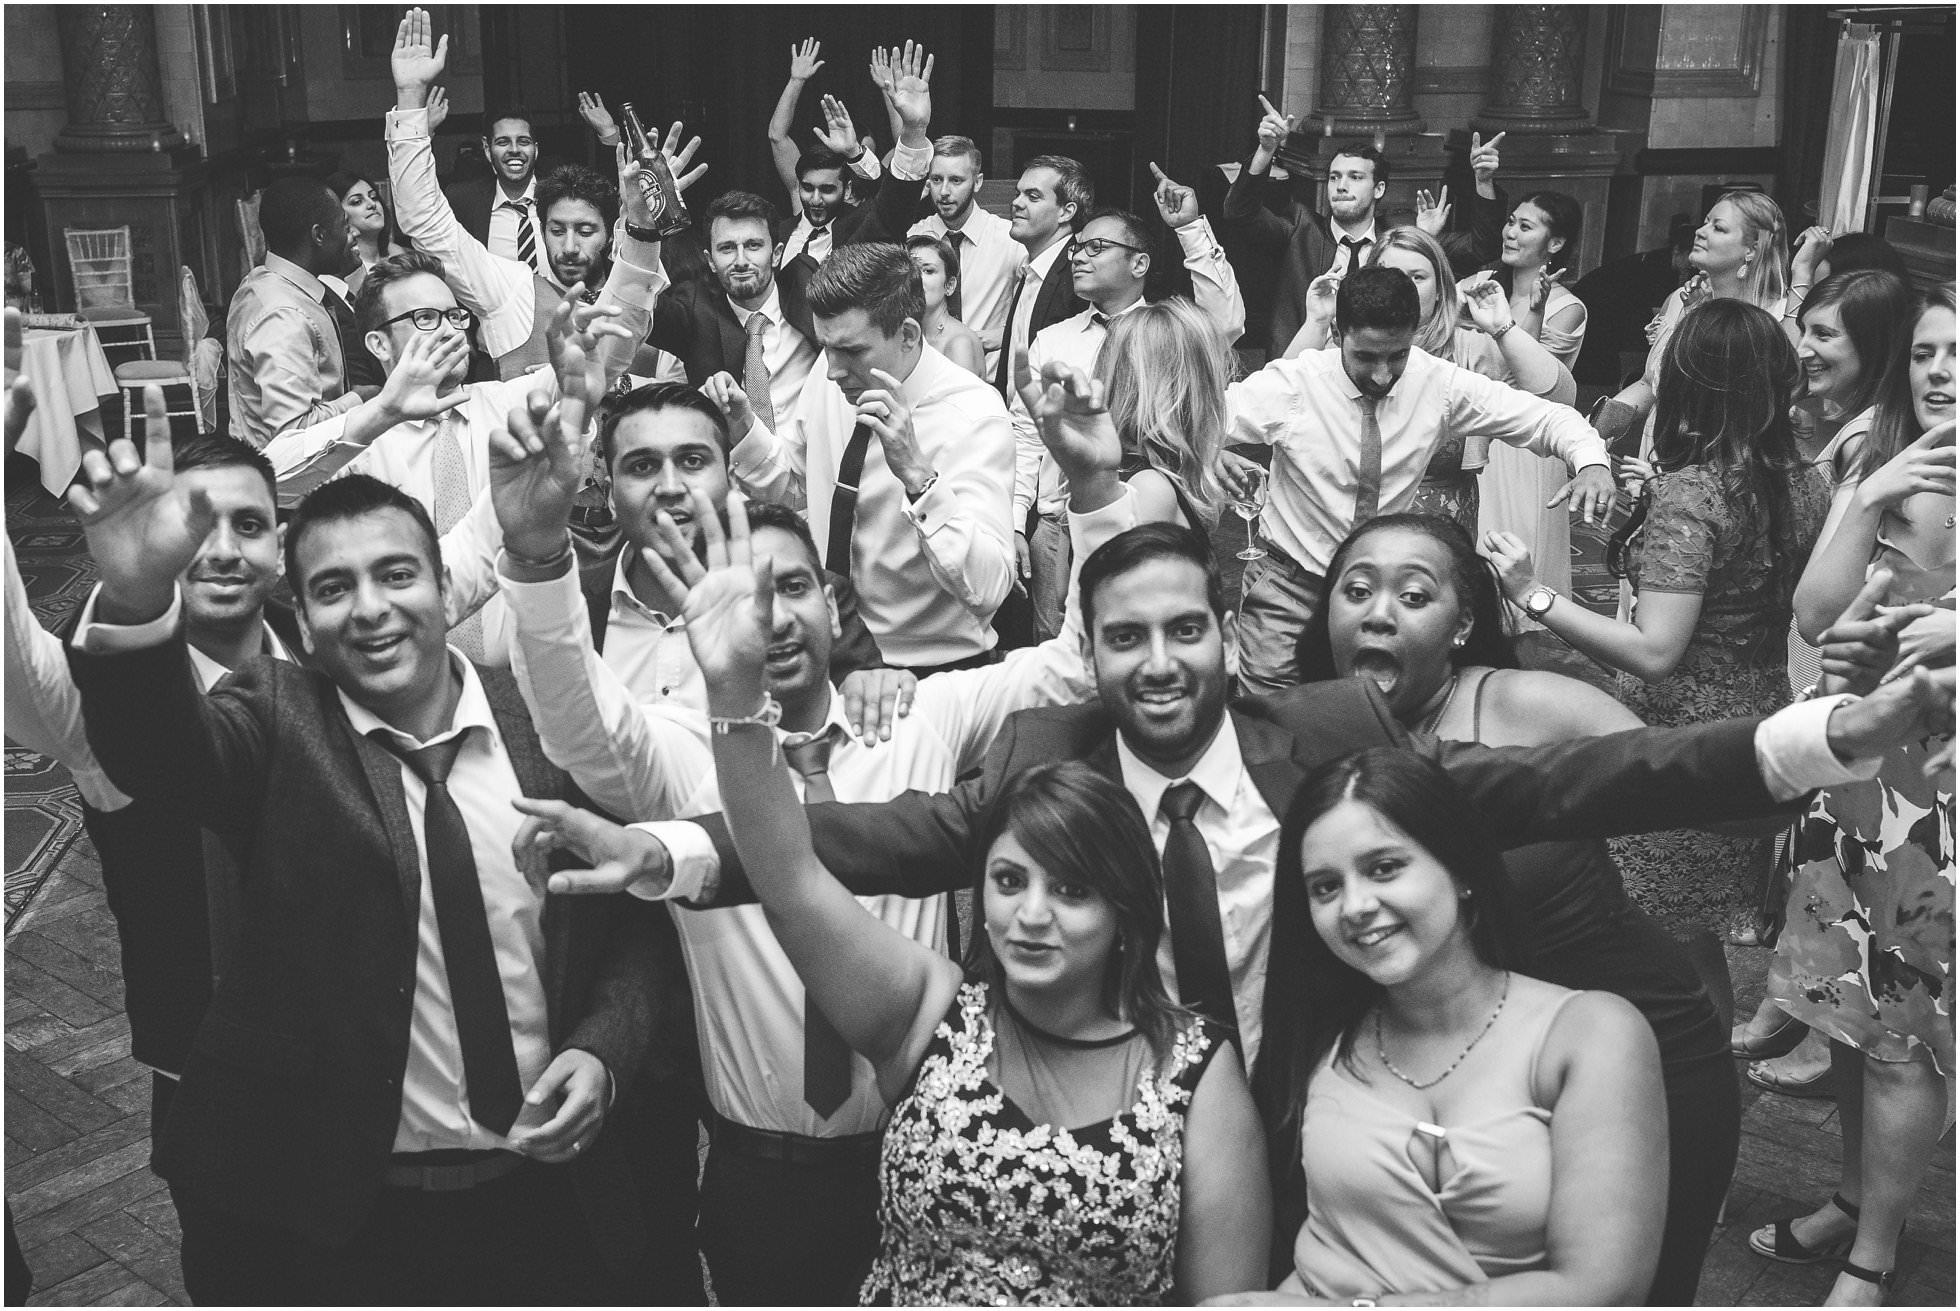 Dancefloor antics at an awesome British-Asian wedding